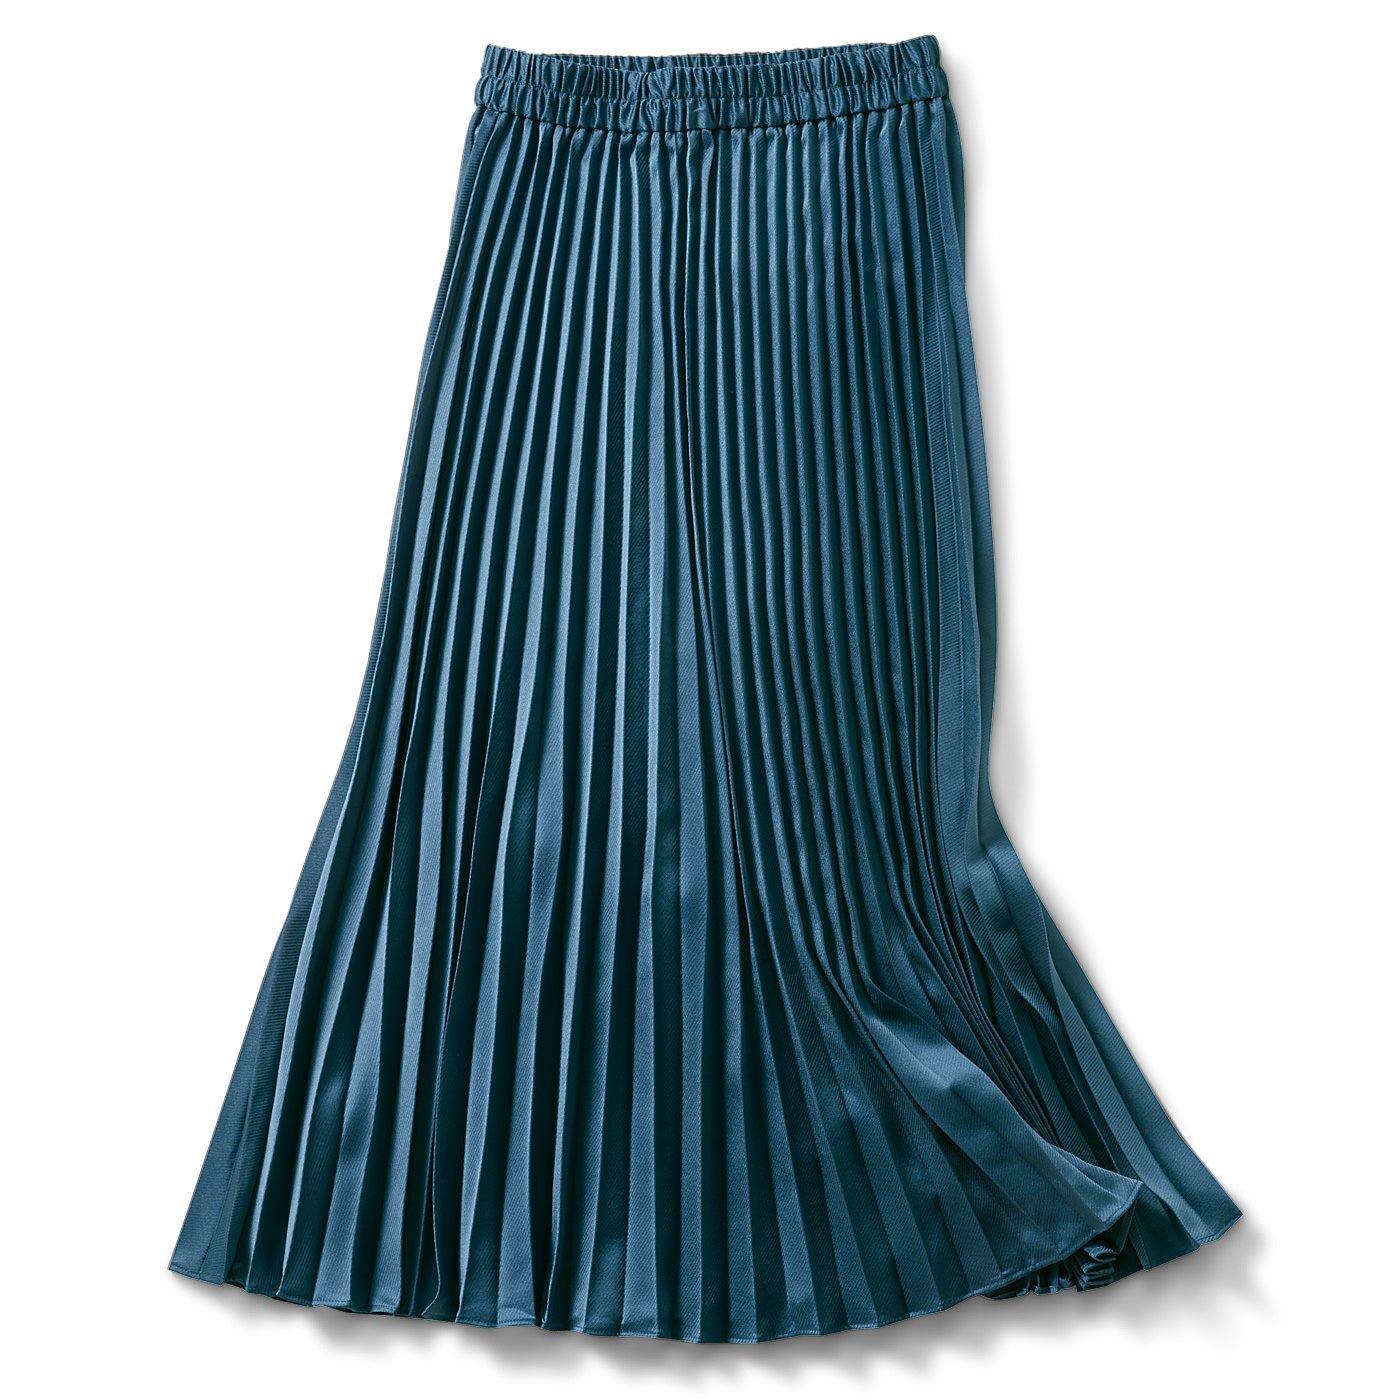 IEDIT[イディット] 斜めストライプ織り柄サテンのプリーツロングスカート〈ブルーグリーン〉